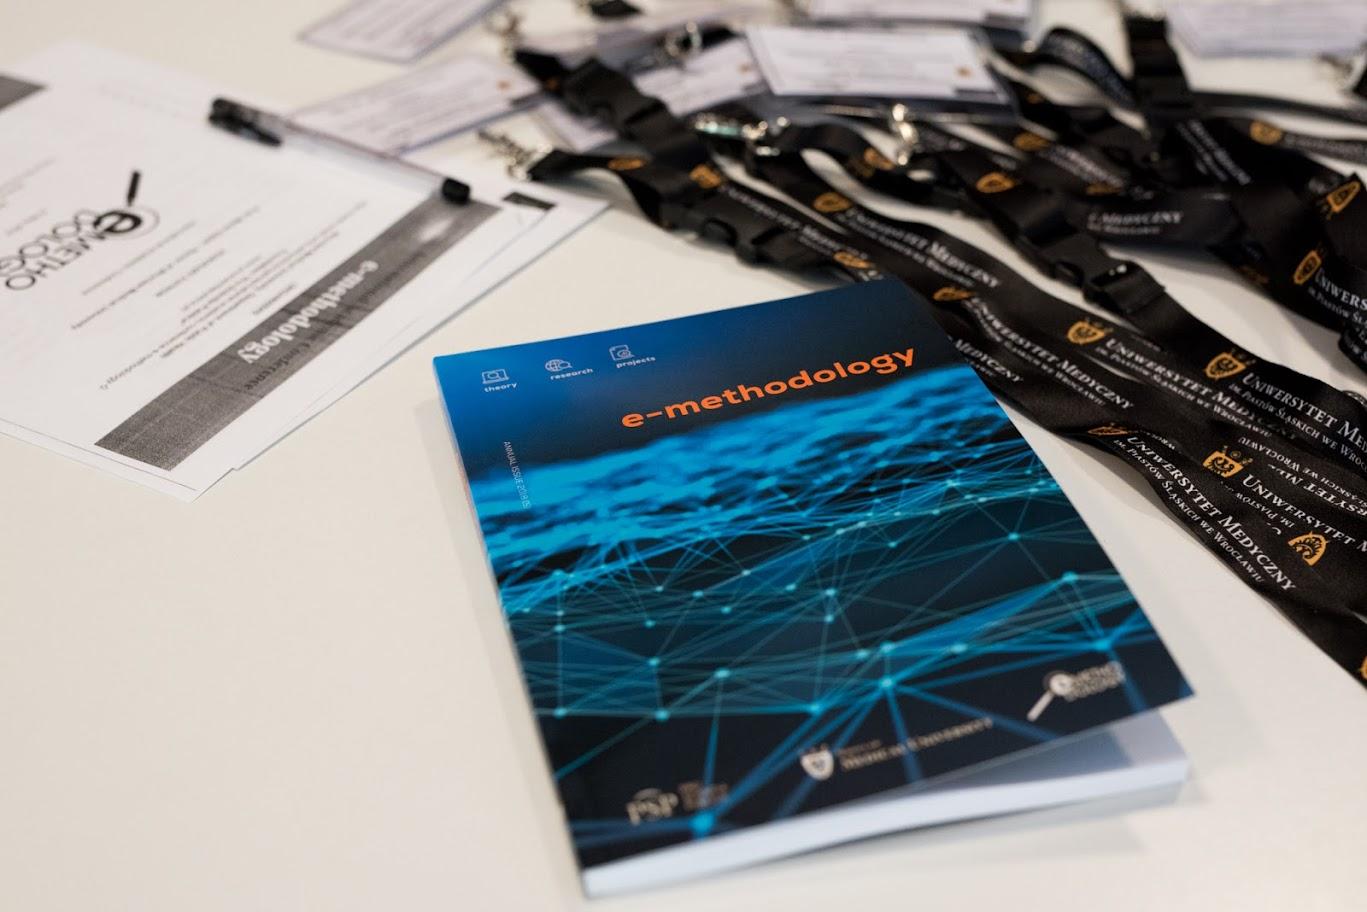 e-methodology conference